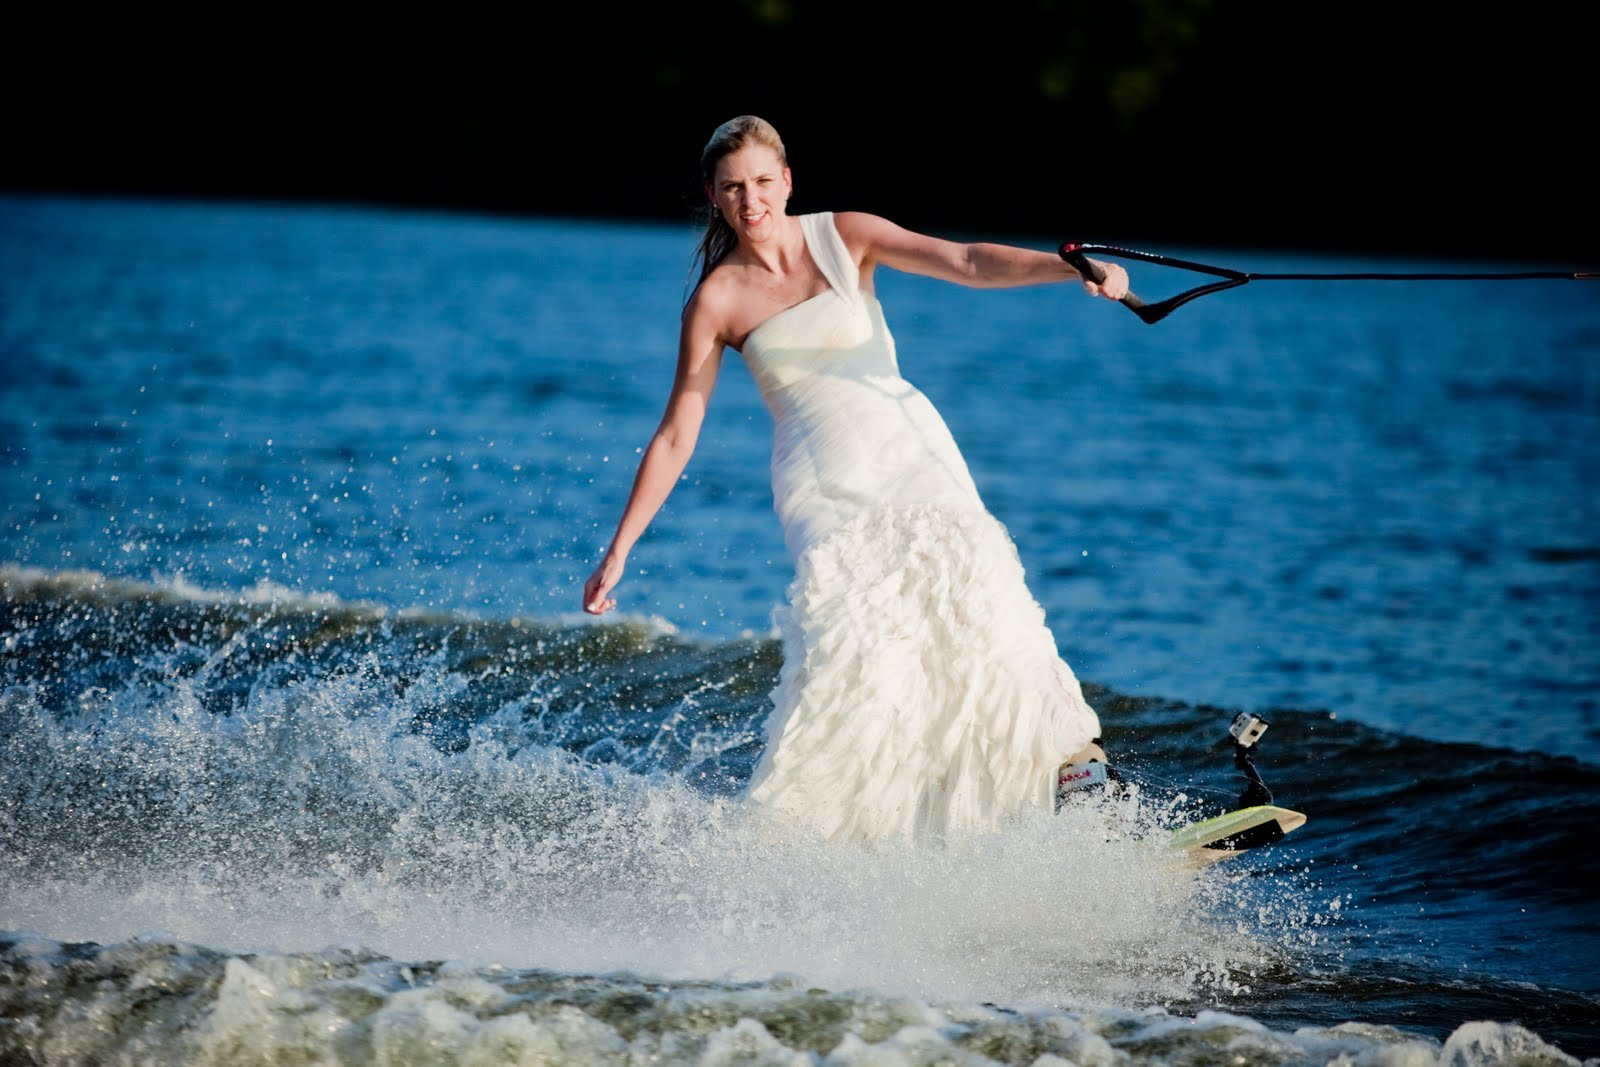 Wedding dresses: wet wedding dresses